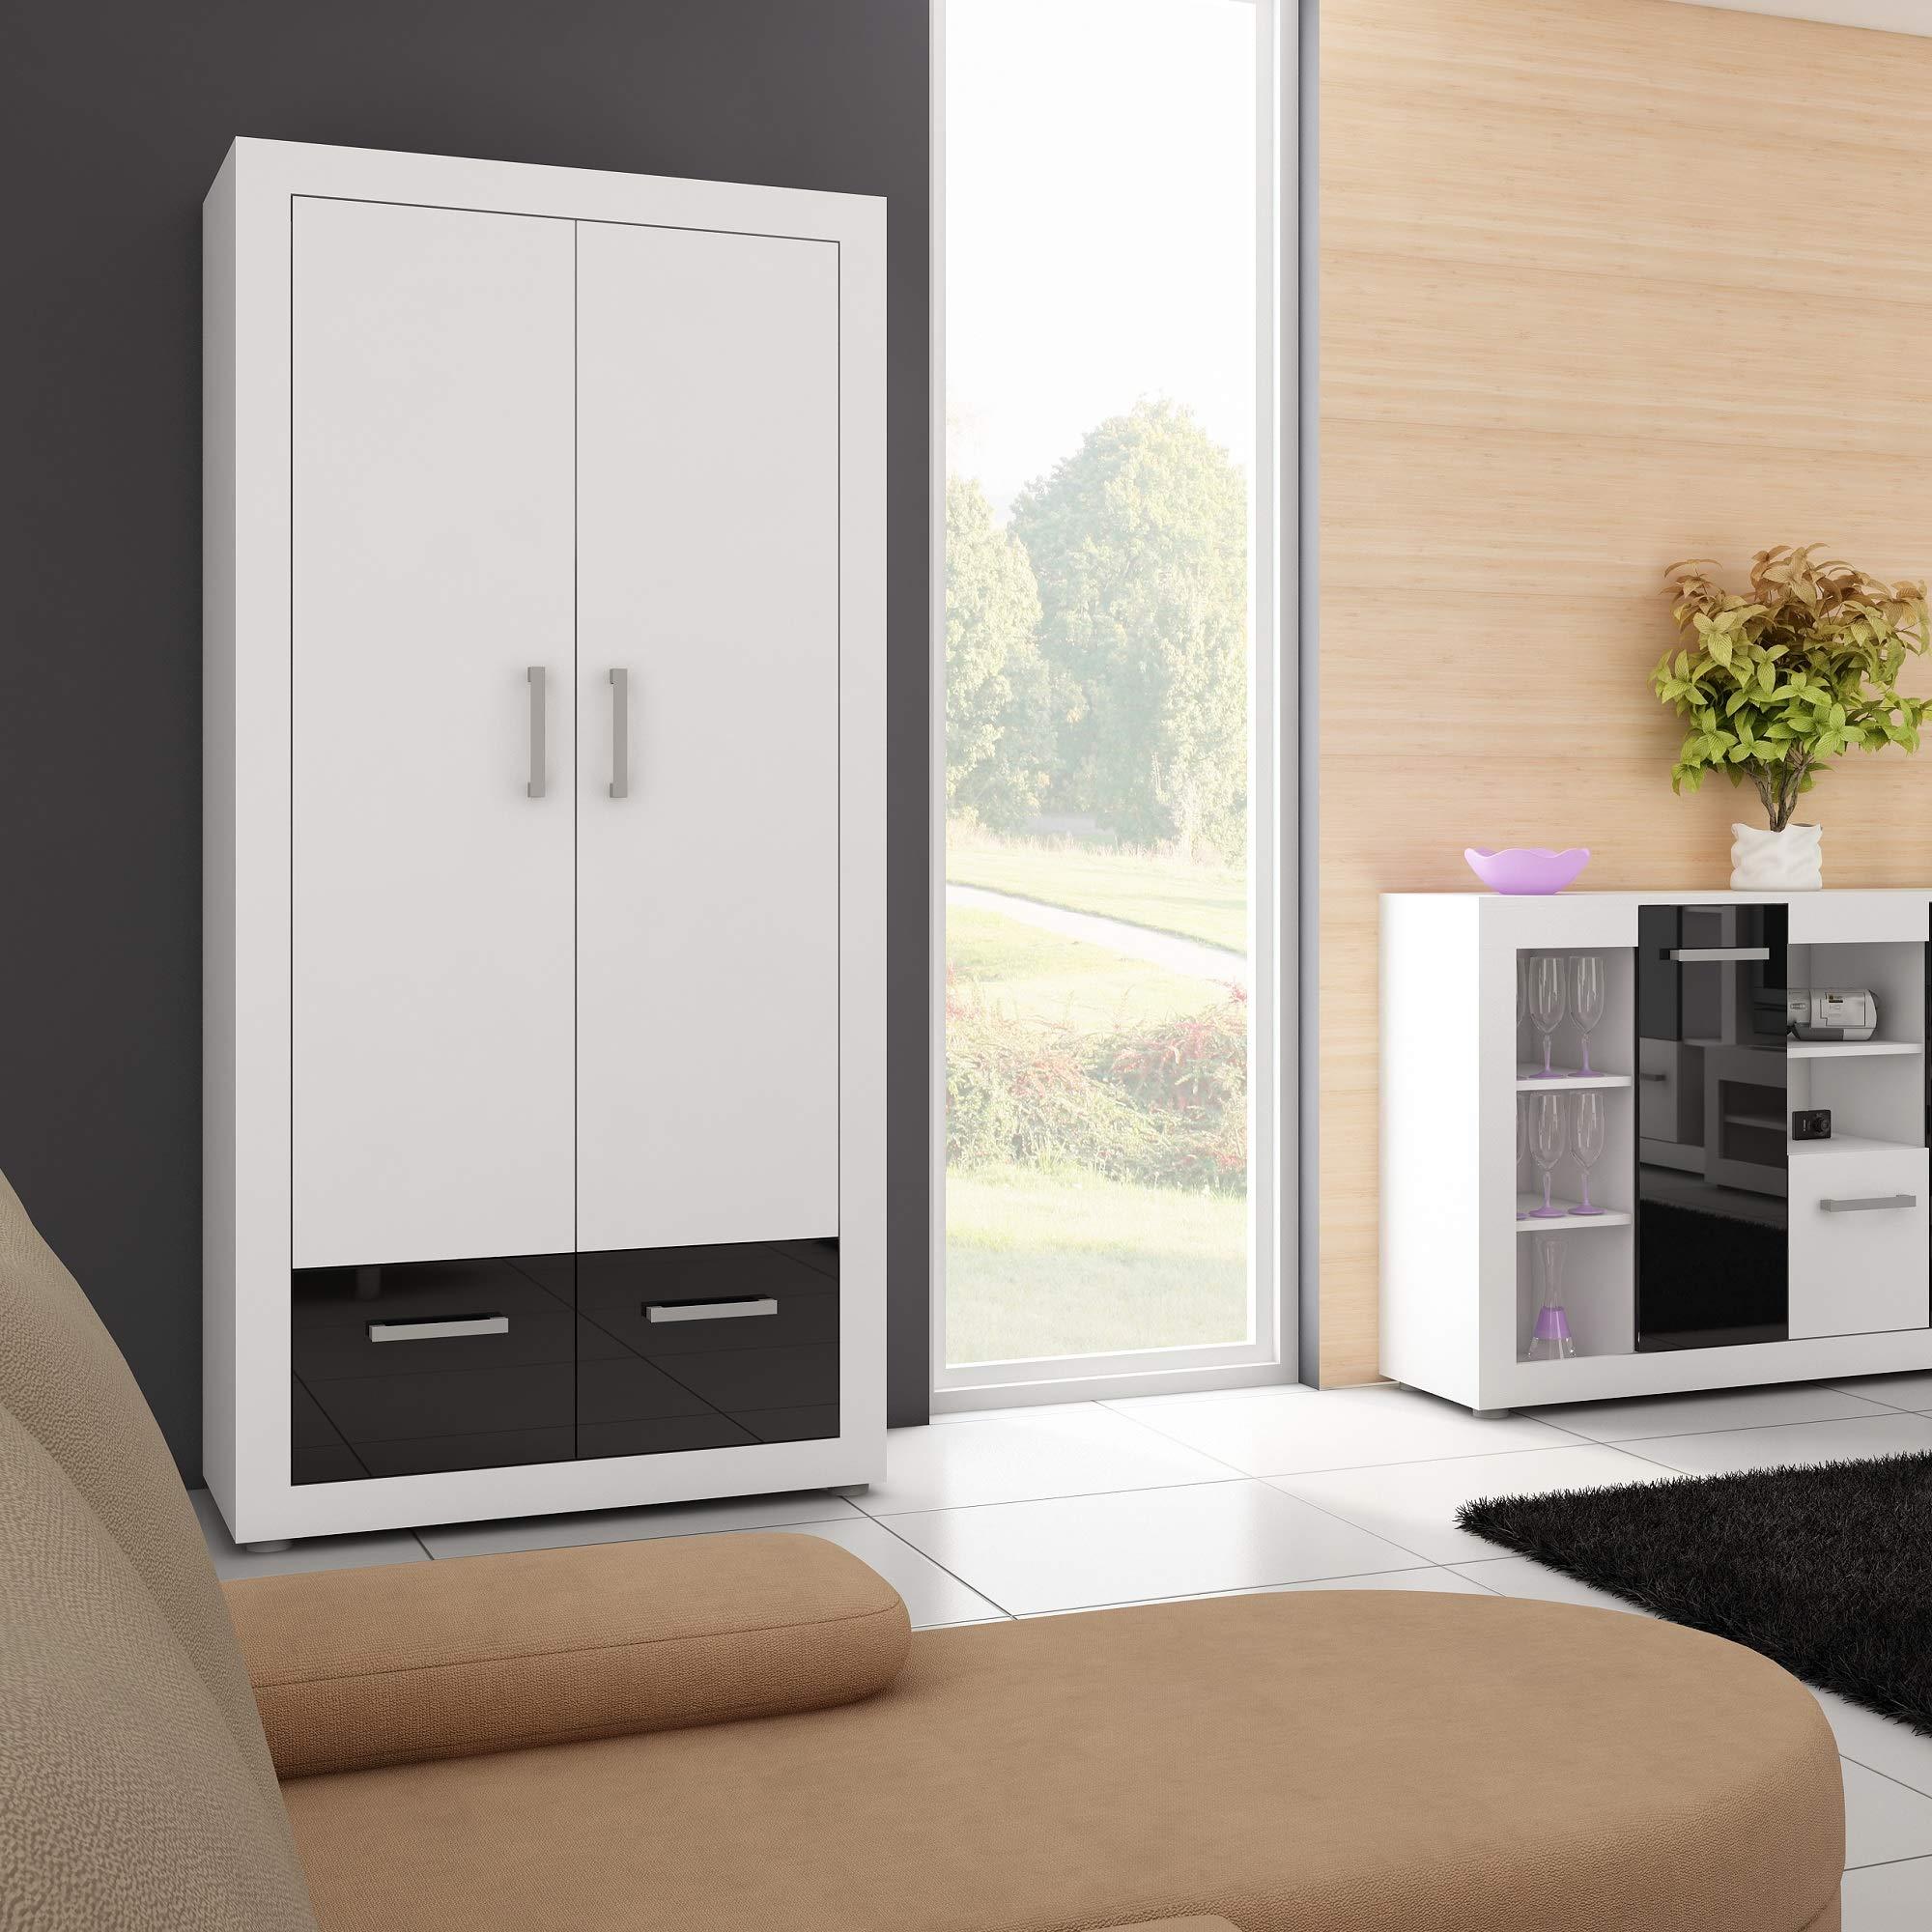 Furniture.Agency Viki Wardrobe Armoire, Multiple Finishes 2 Doors 2 Drawers White/White/Black Gloss White/White/Black Gloss